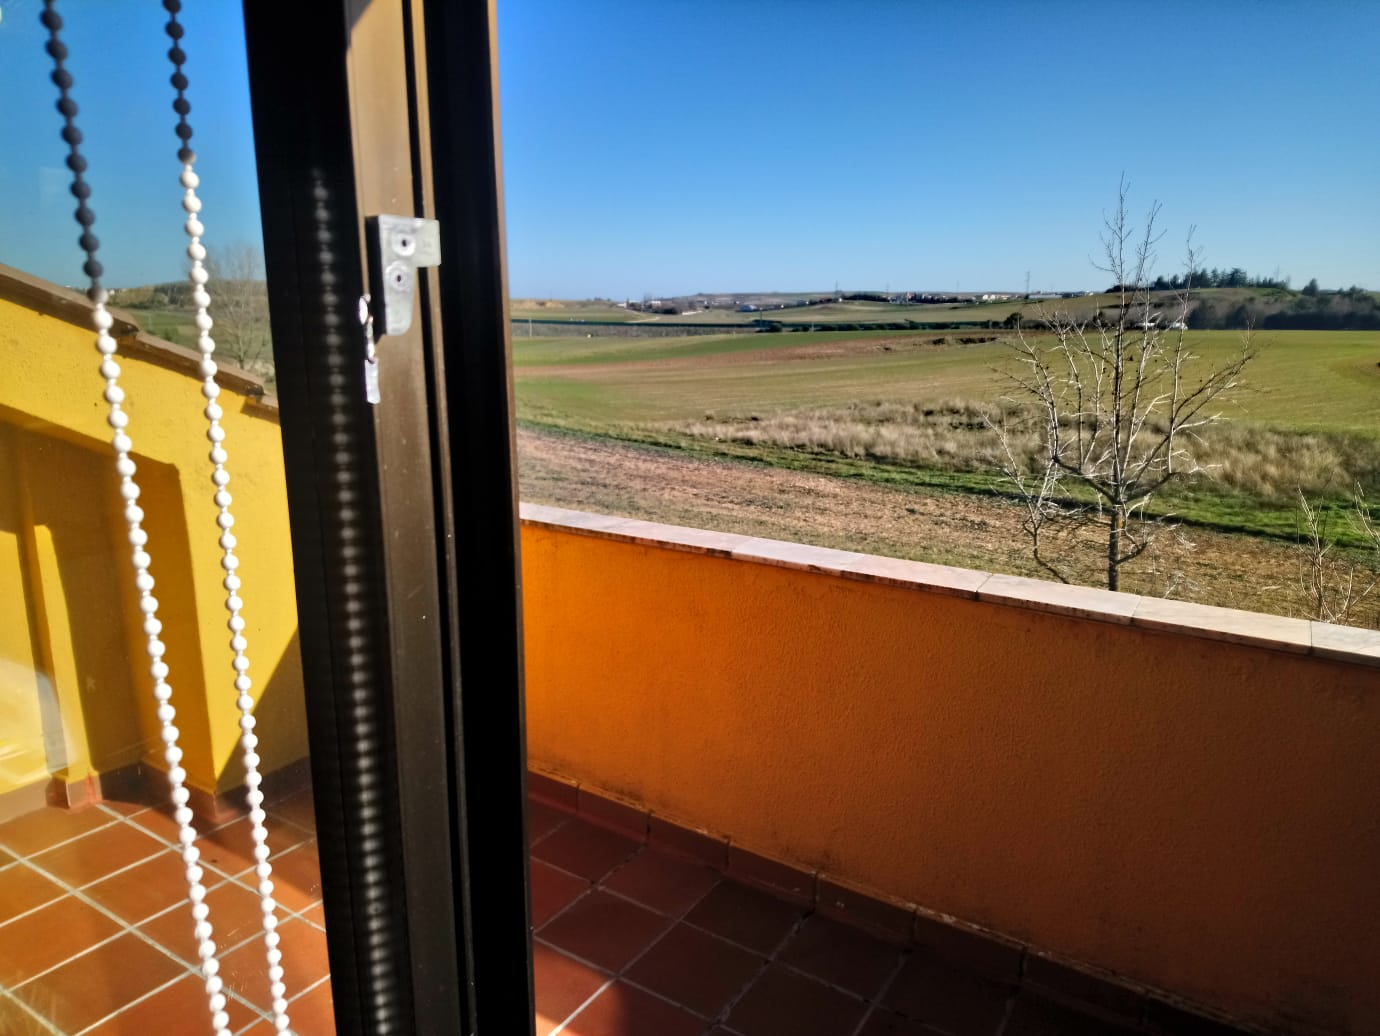 CHALET ADOSADO EN URBANIZACION LAS CANTERAS DE VILLAMAYOR (REF: 297) - foto 32 3ce26fcc-2dc2-4f82-a096-d8212e4587e7.jpg